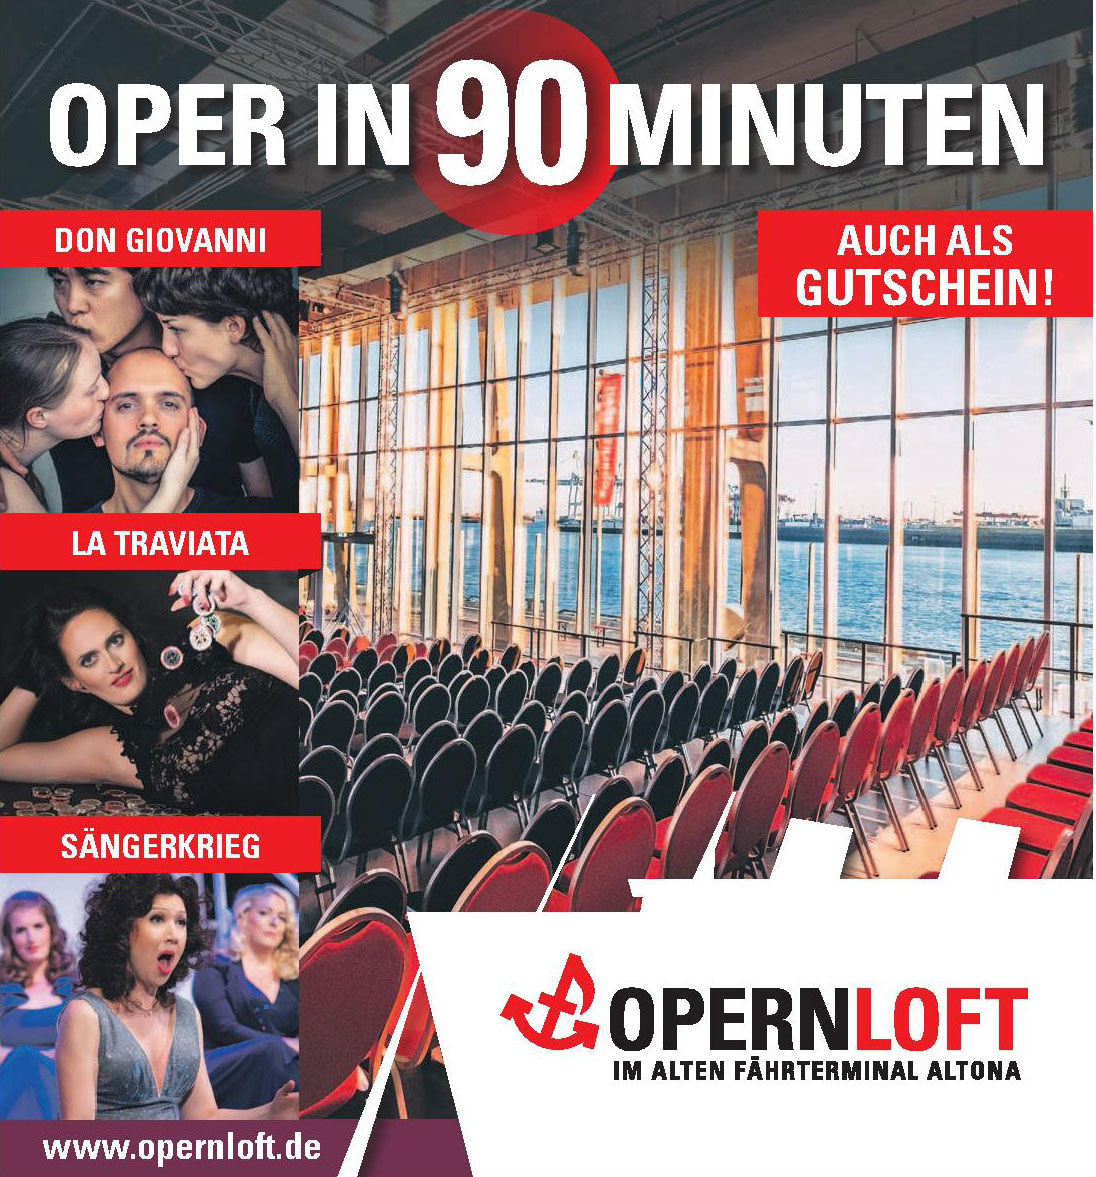 Opernloft